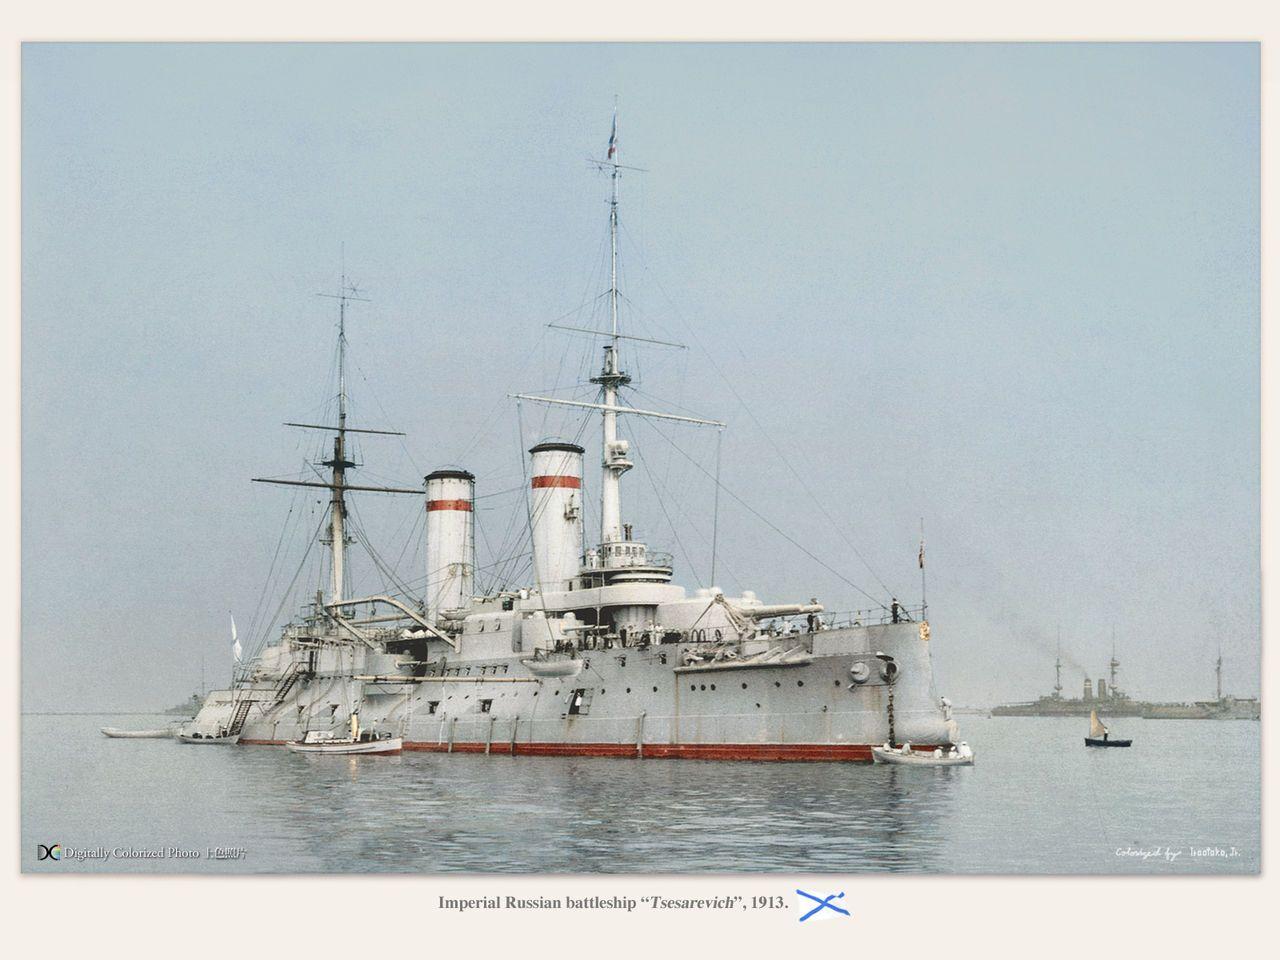 American battleships on the teachings, 1913